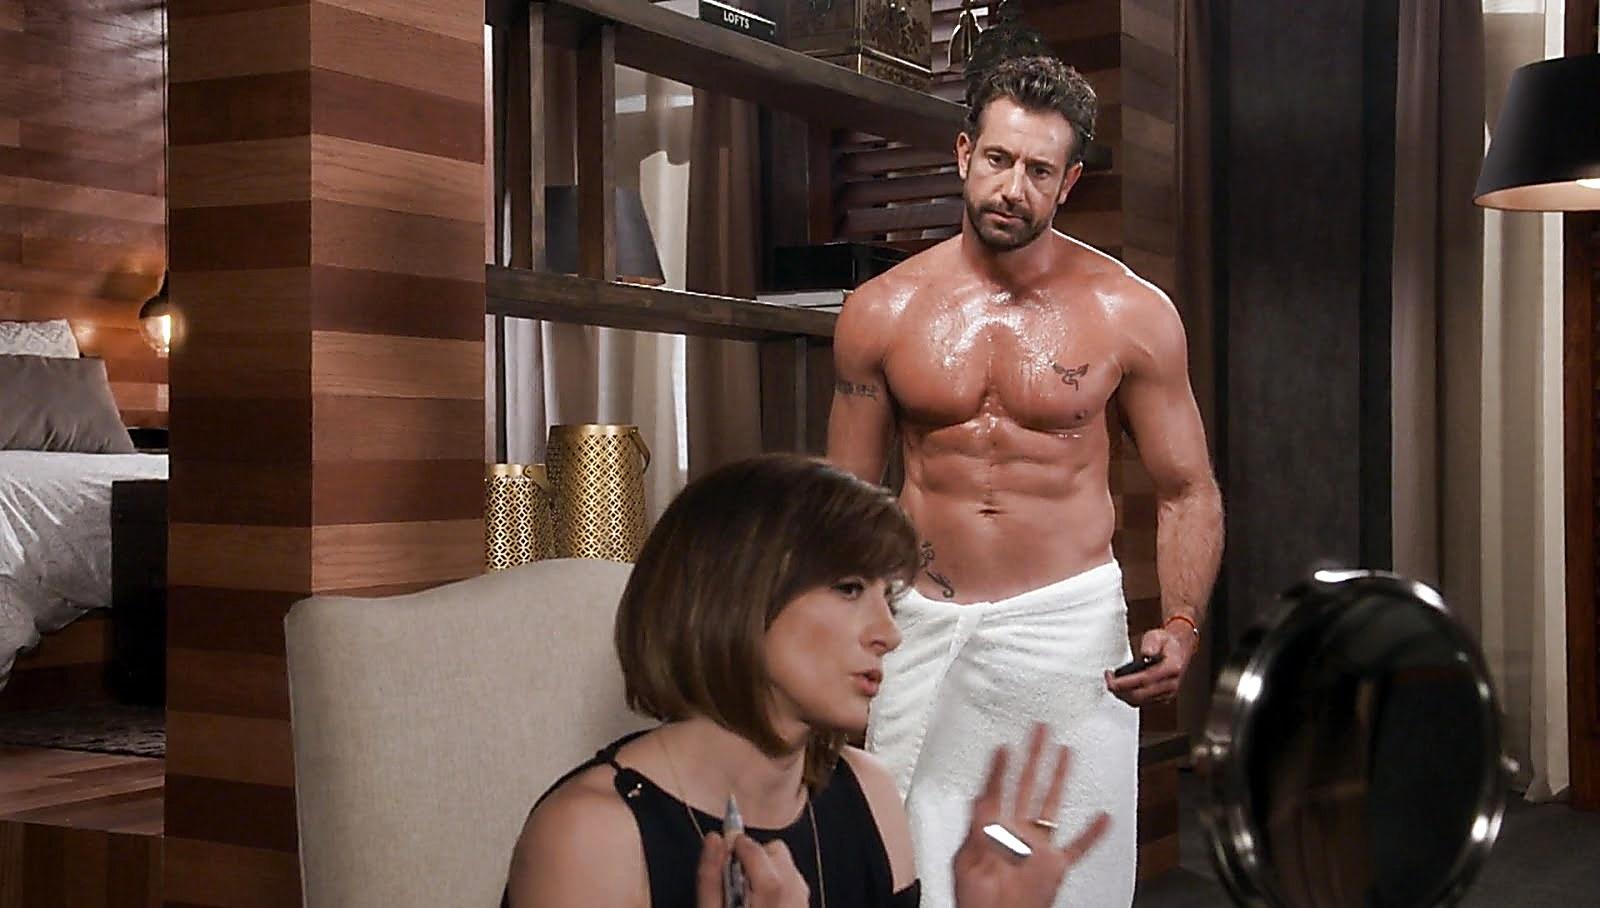 Gabriel Soto sexy shirtless scene November 10, 2017, 3pm